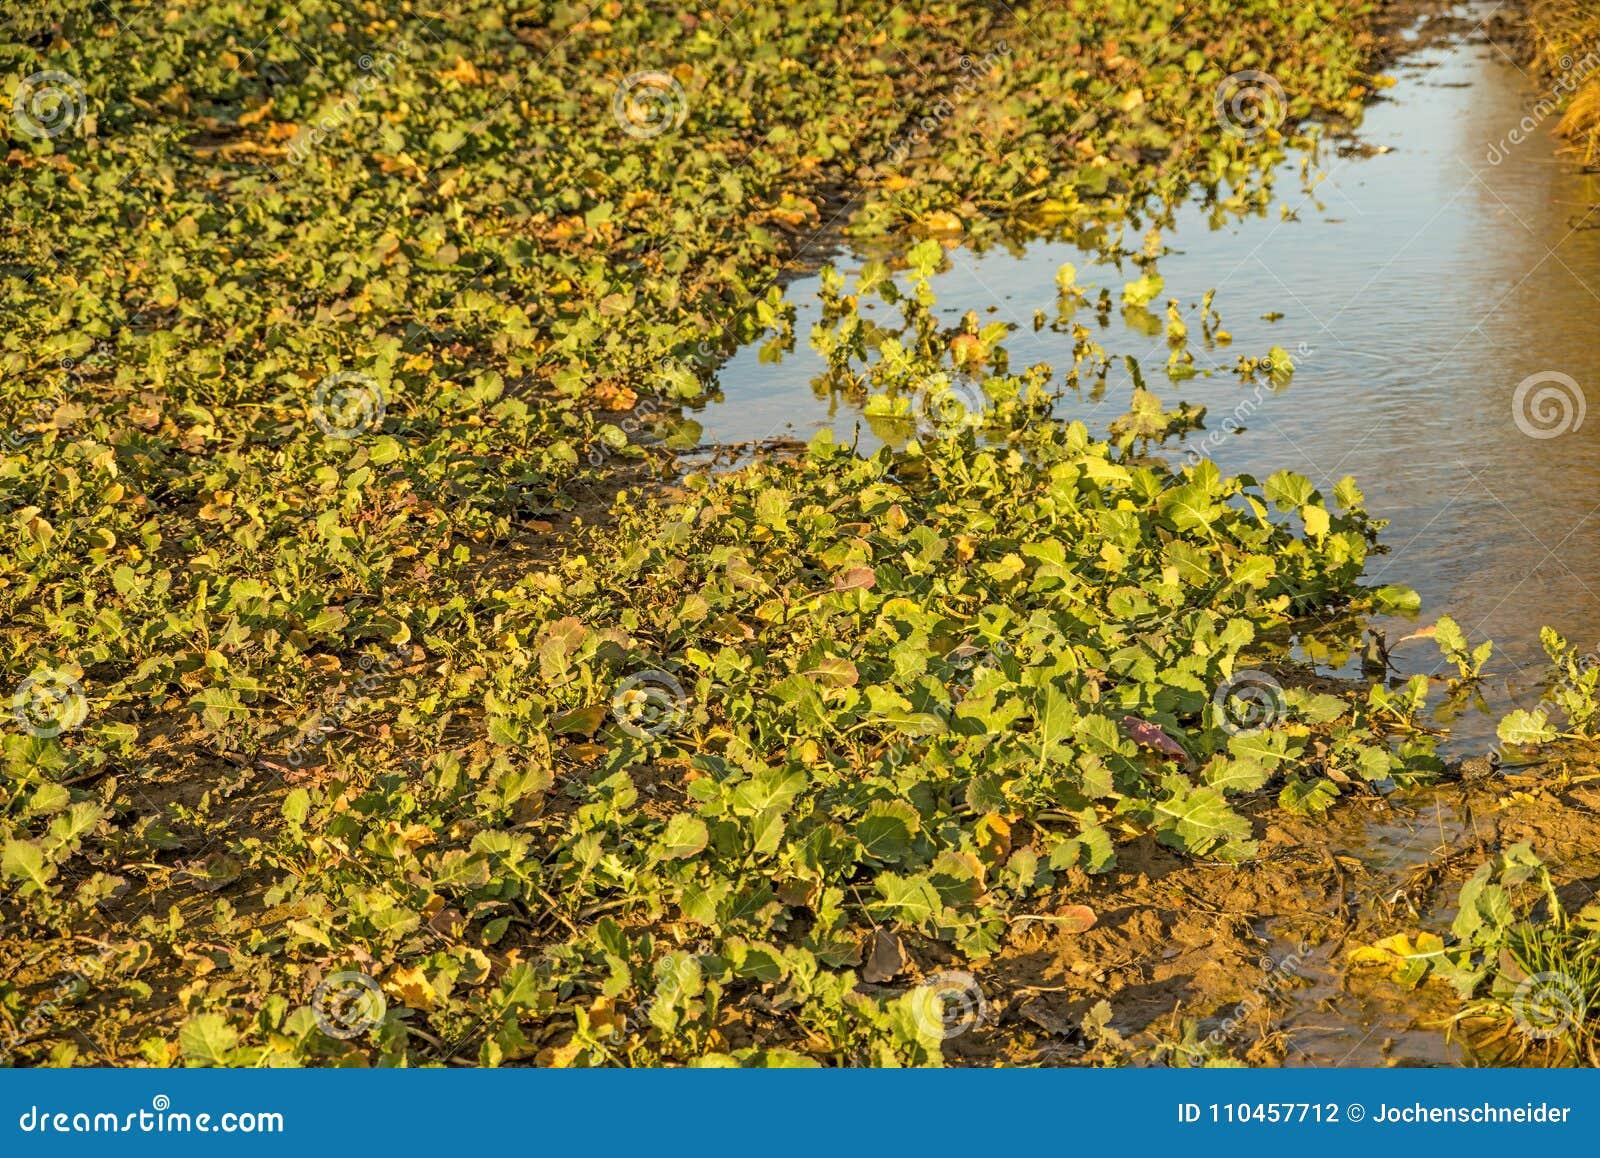 Olje- rädisa, grön gödsel